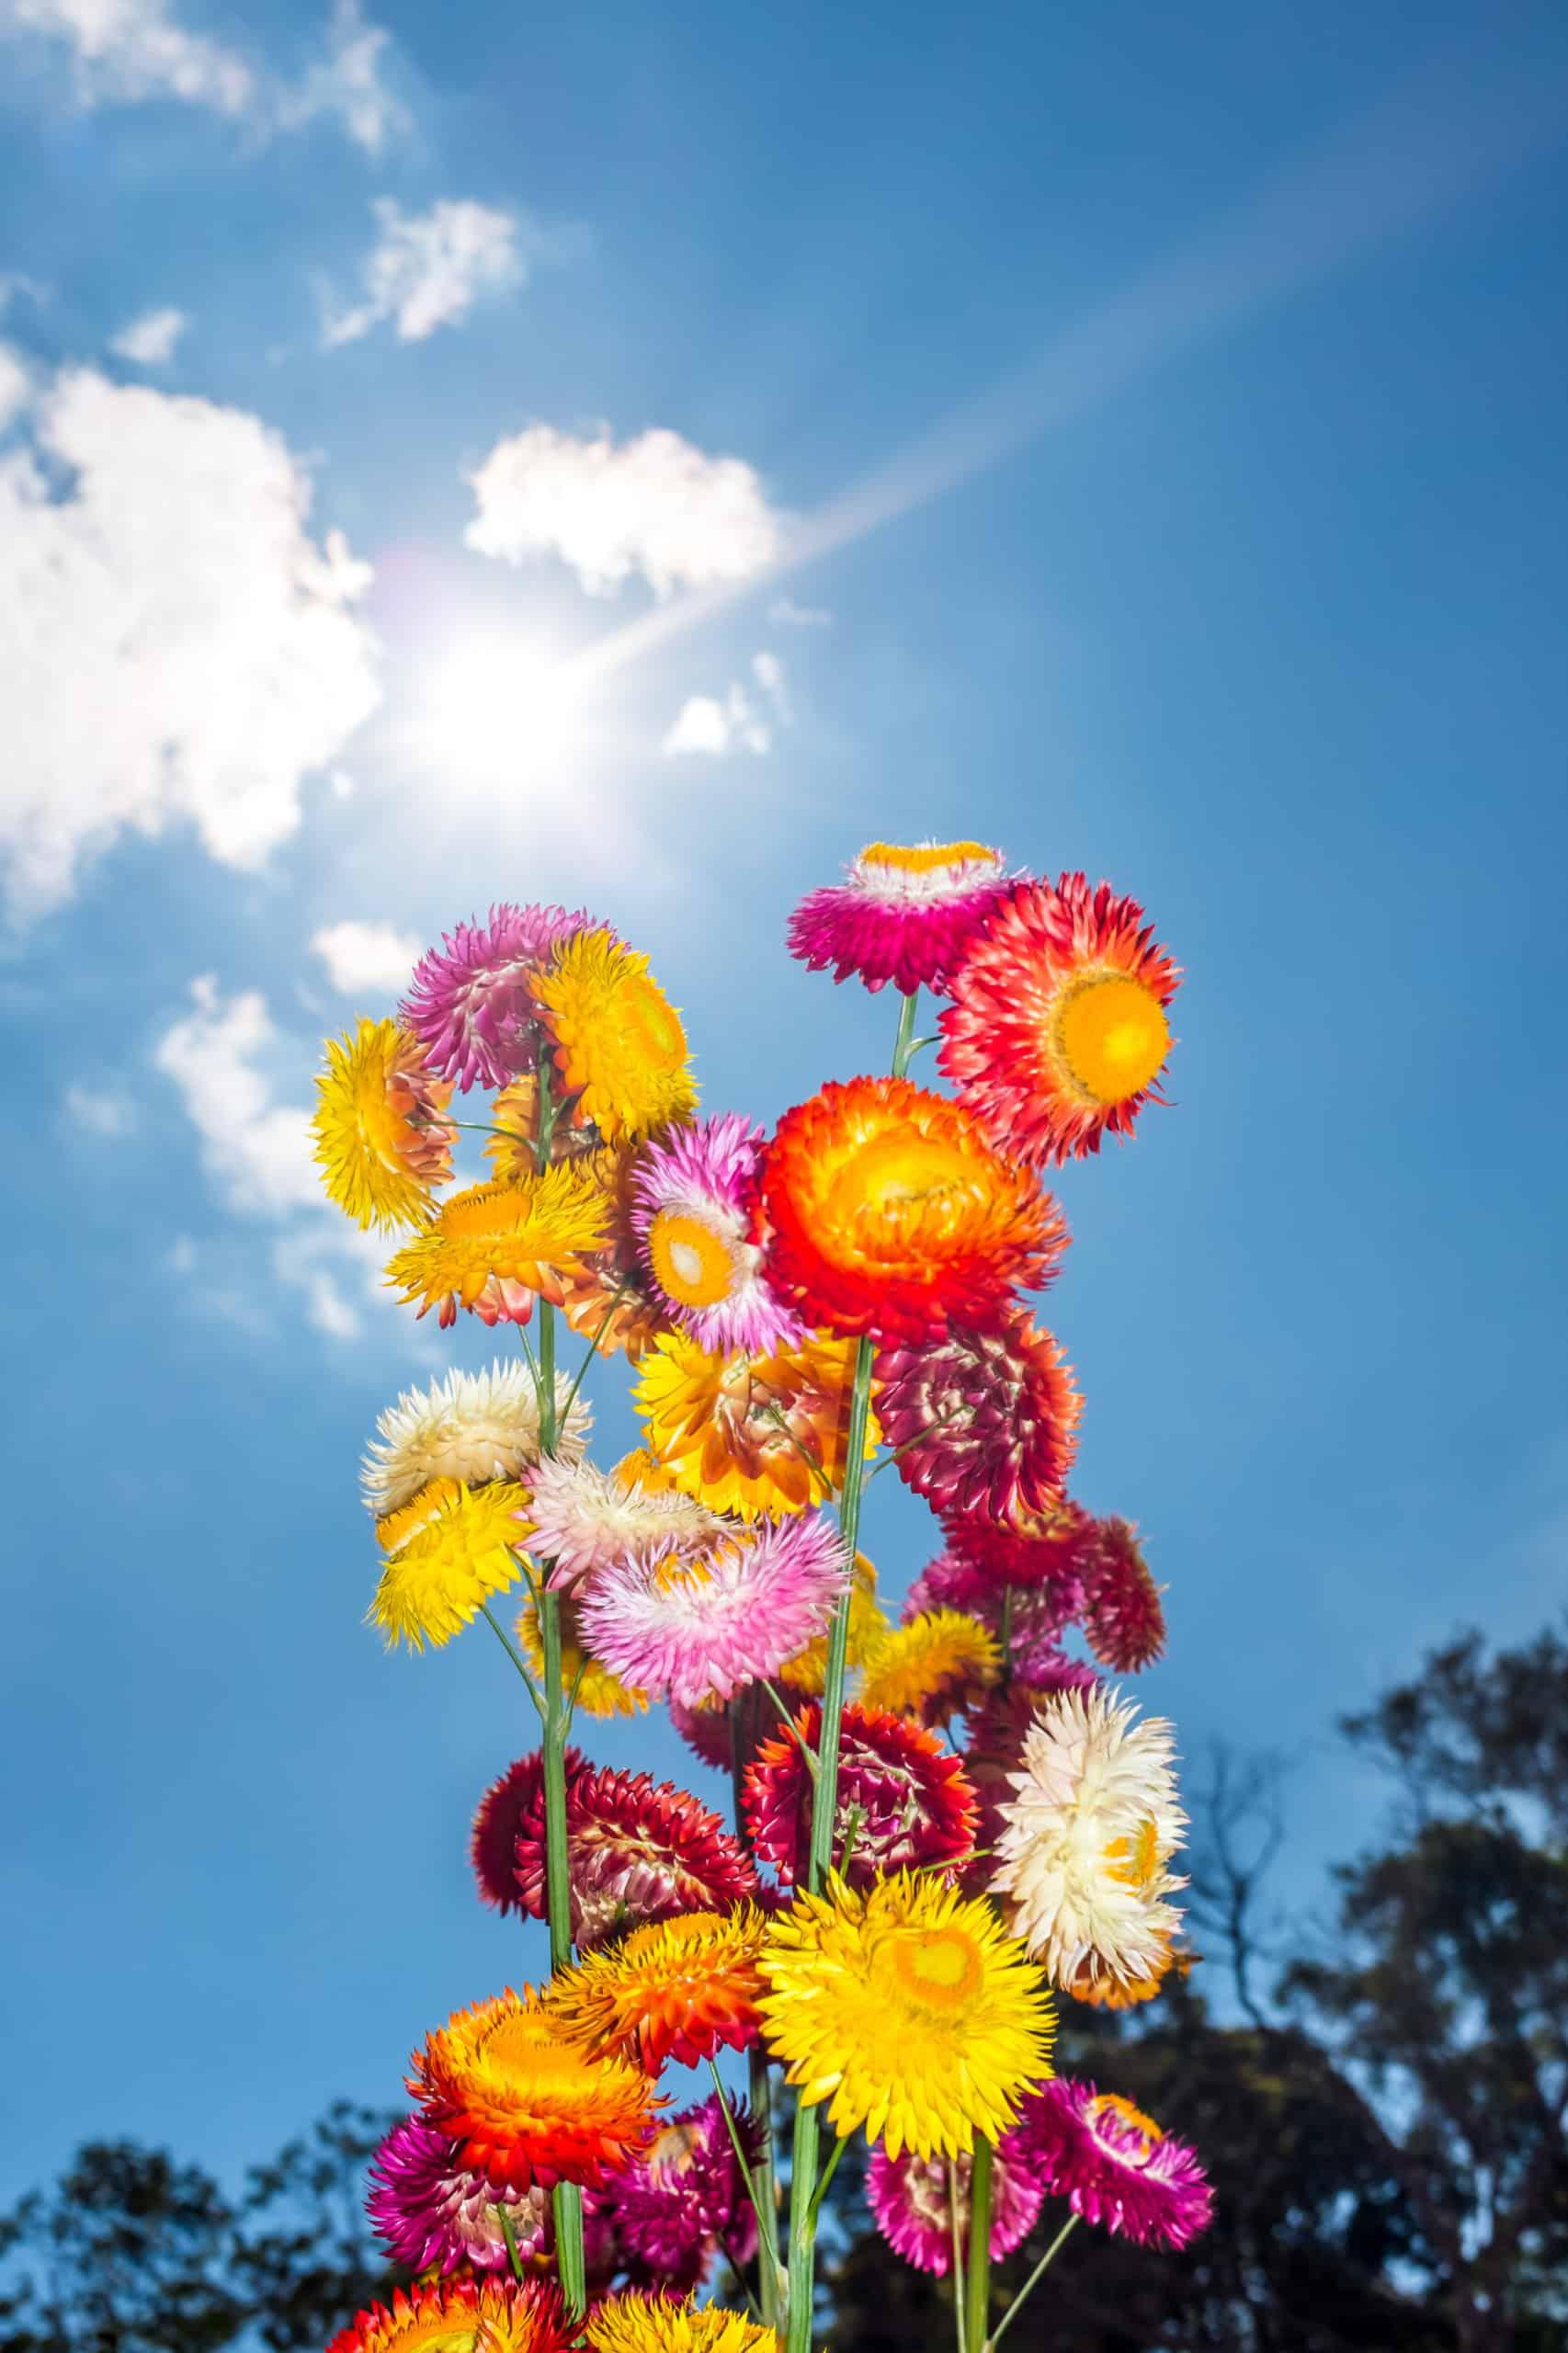 Everlasting-Flower-Helichrysum-Bracteatum